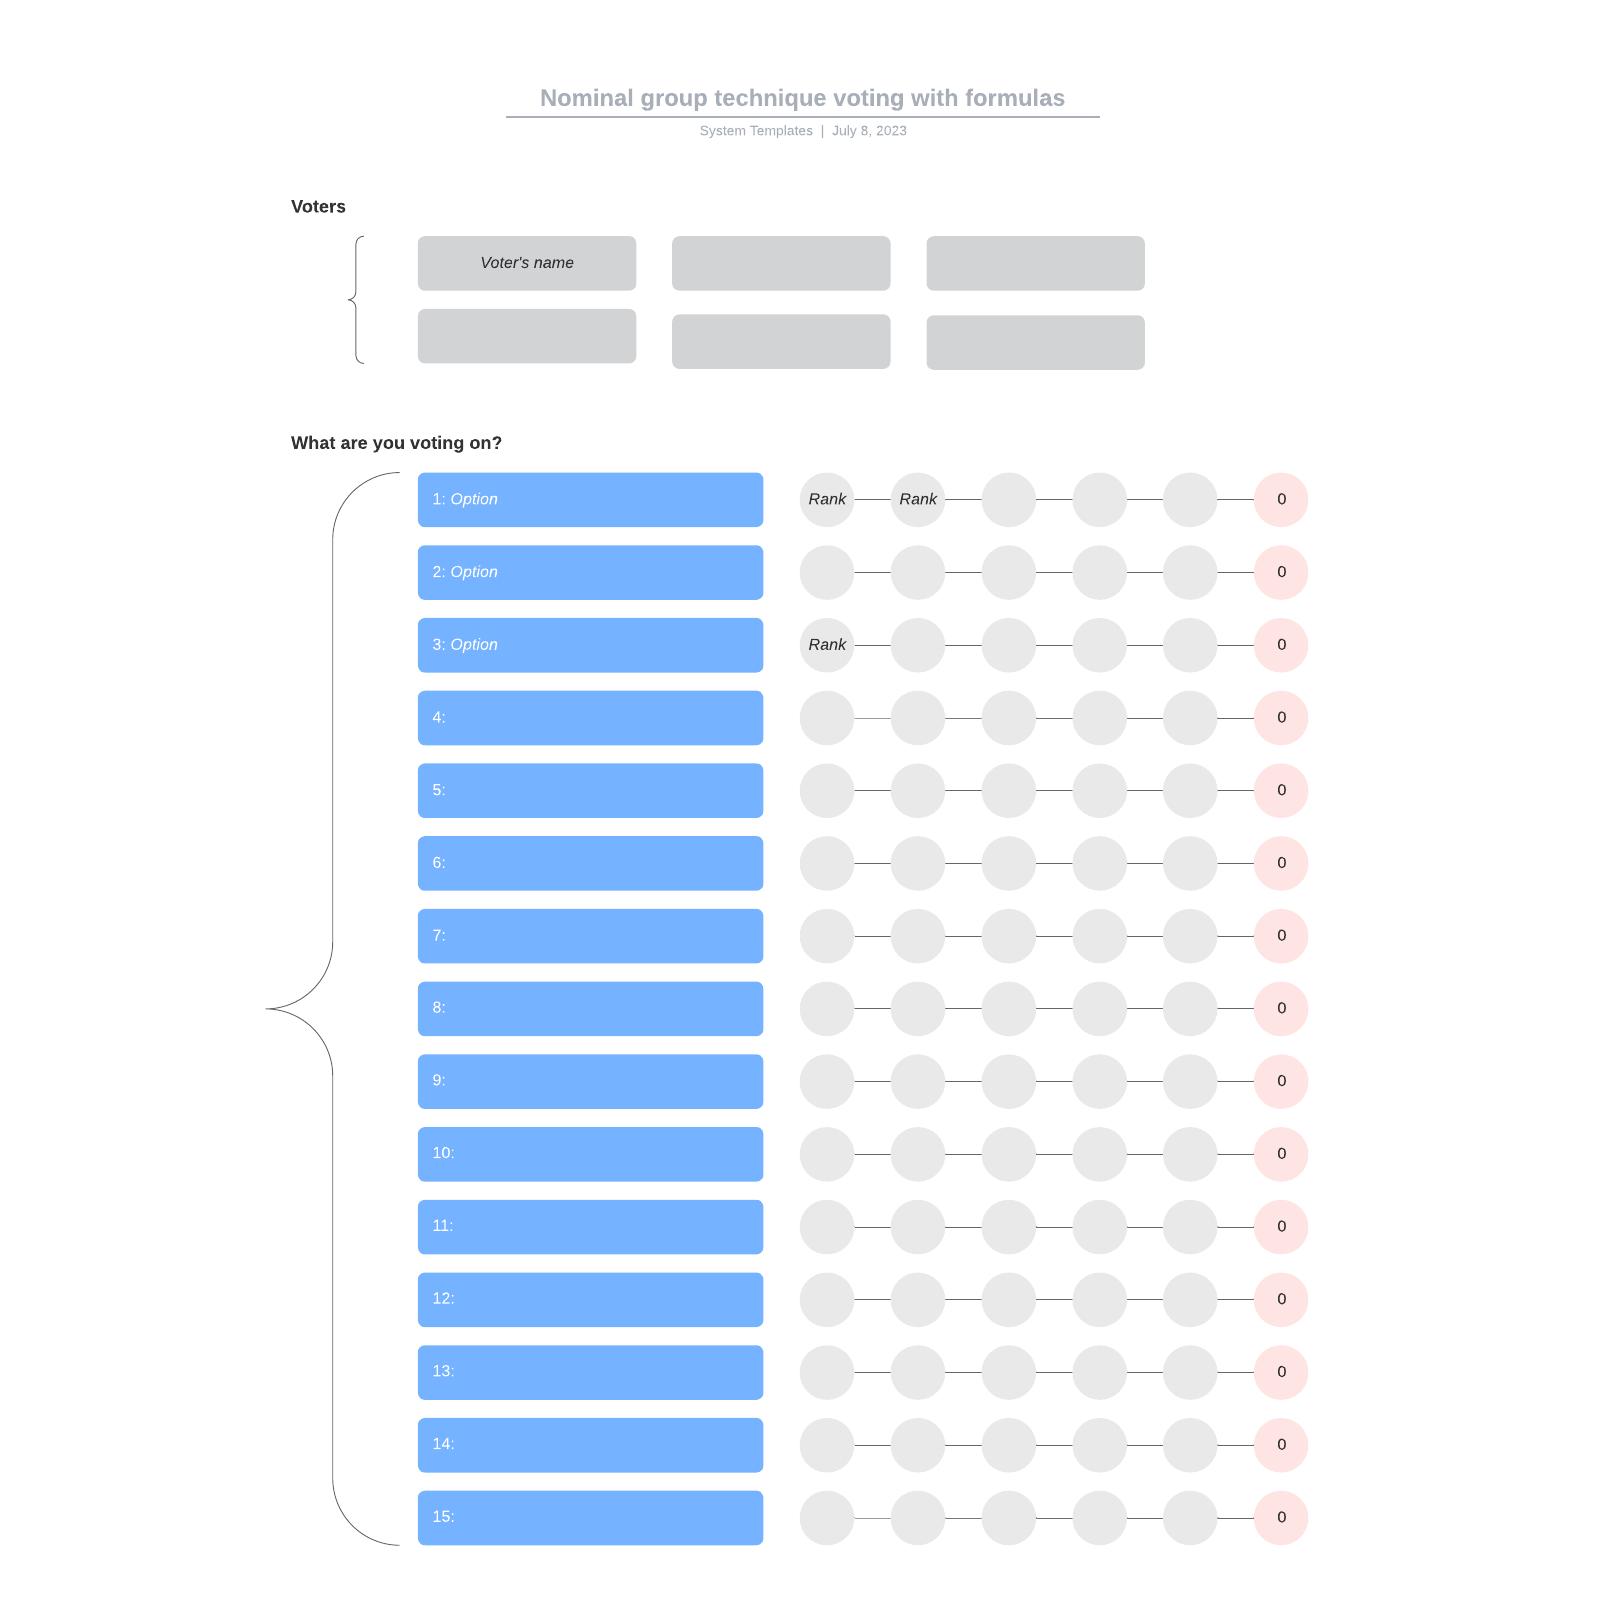 Nominal group technique voting with formulas